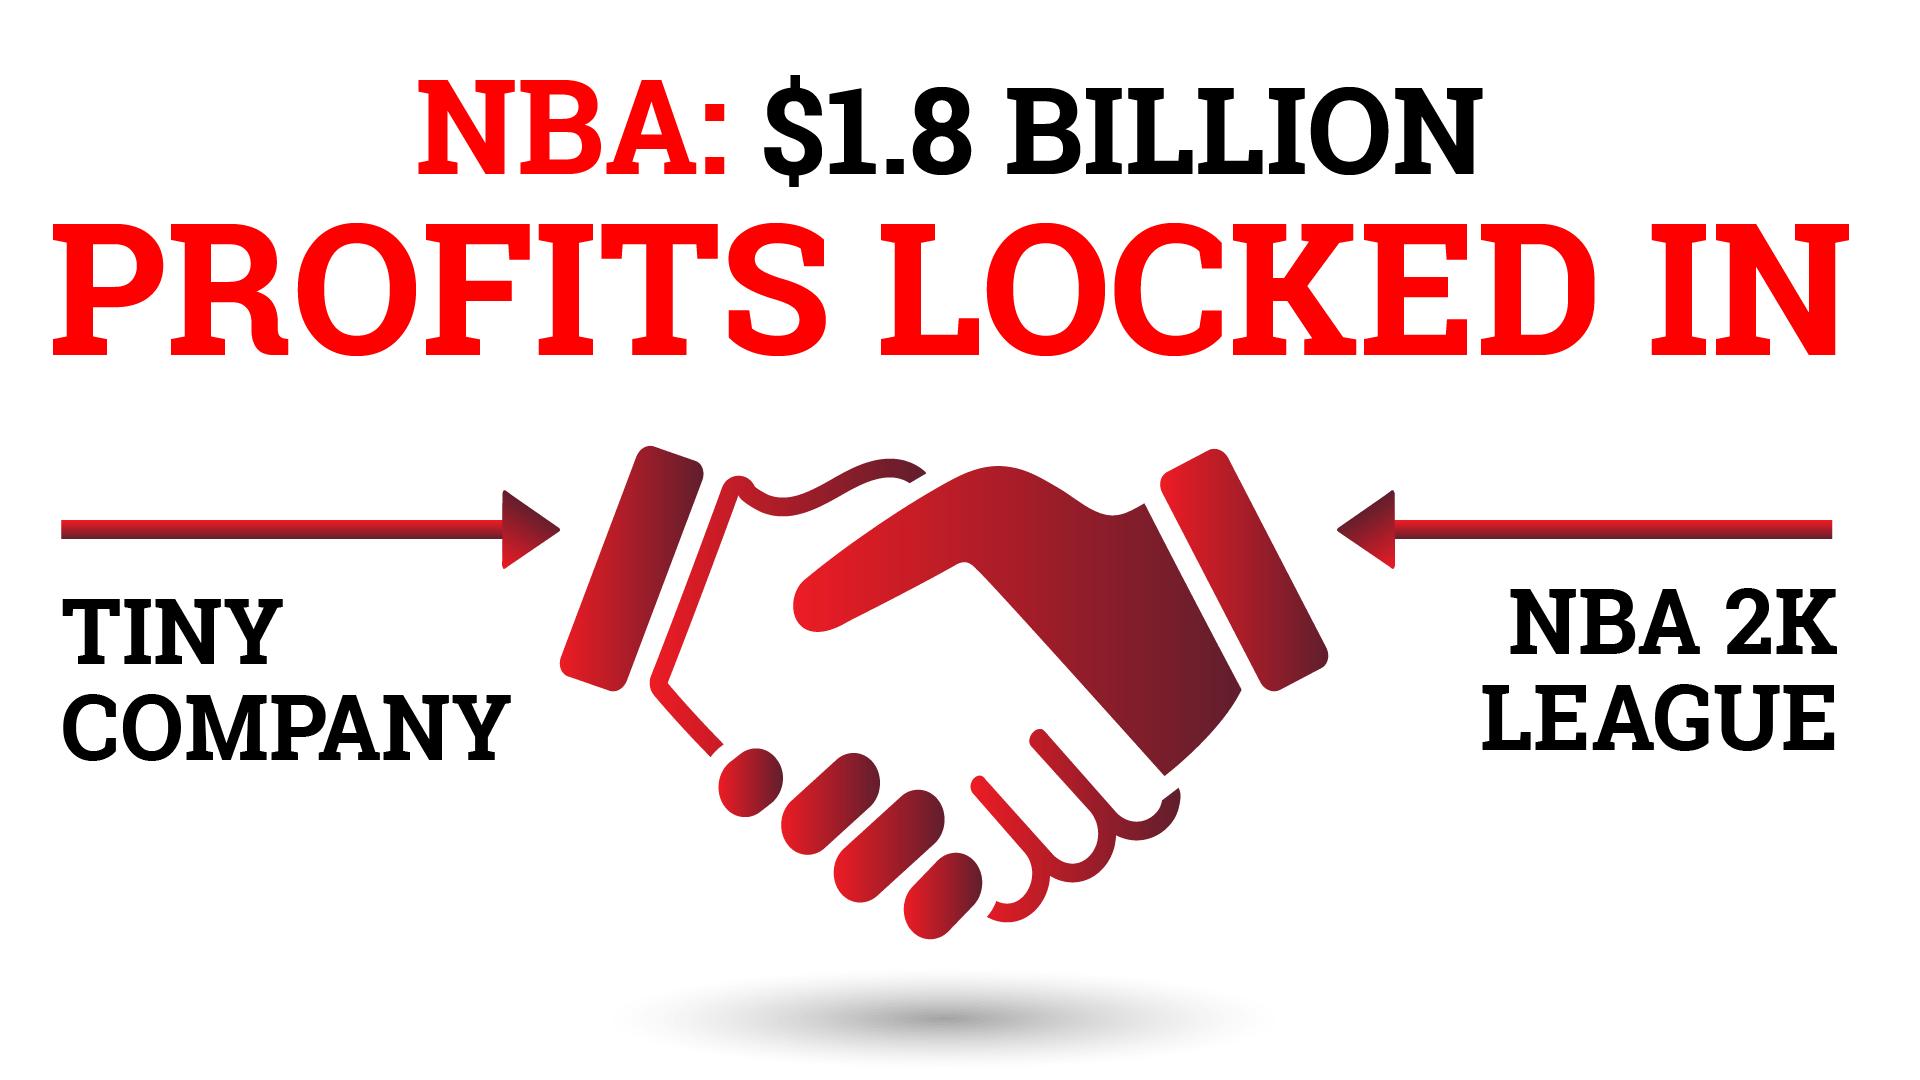 NBA: $1.8 Billion. Profits Locked In